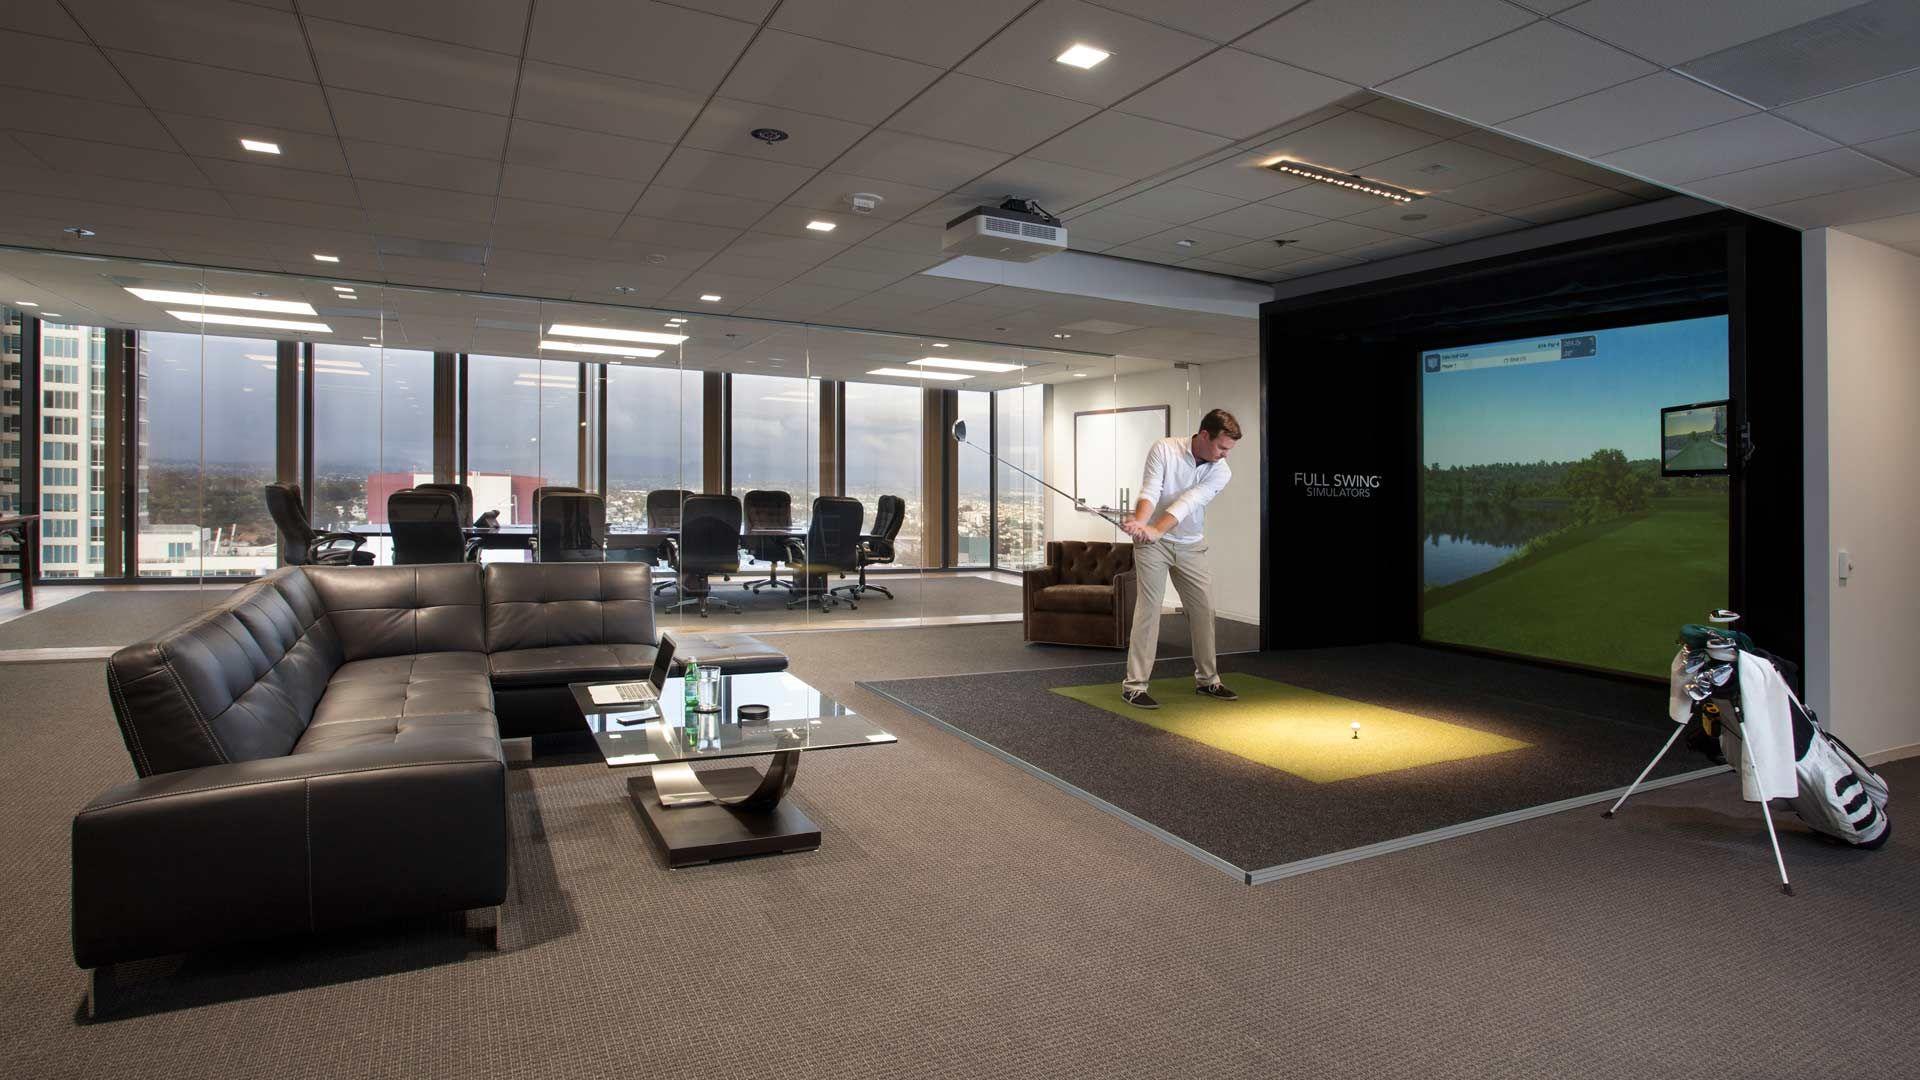 Full Swing Golf: Indoor Golf Simulator Technology S4 Simulator | 10 ...